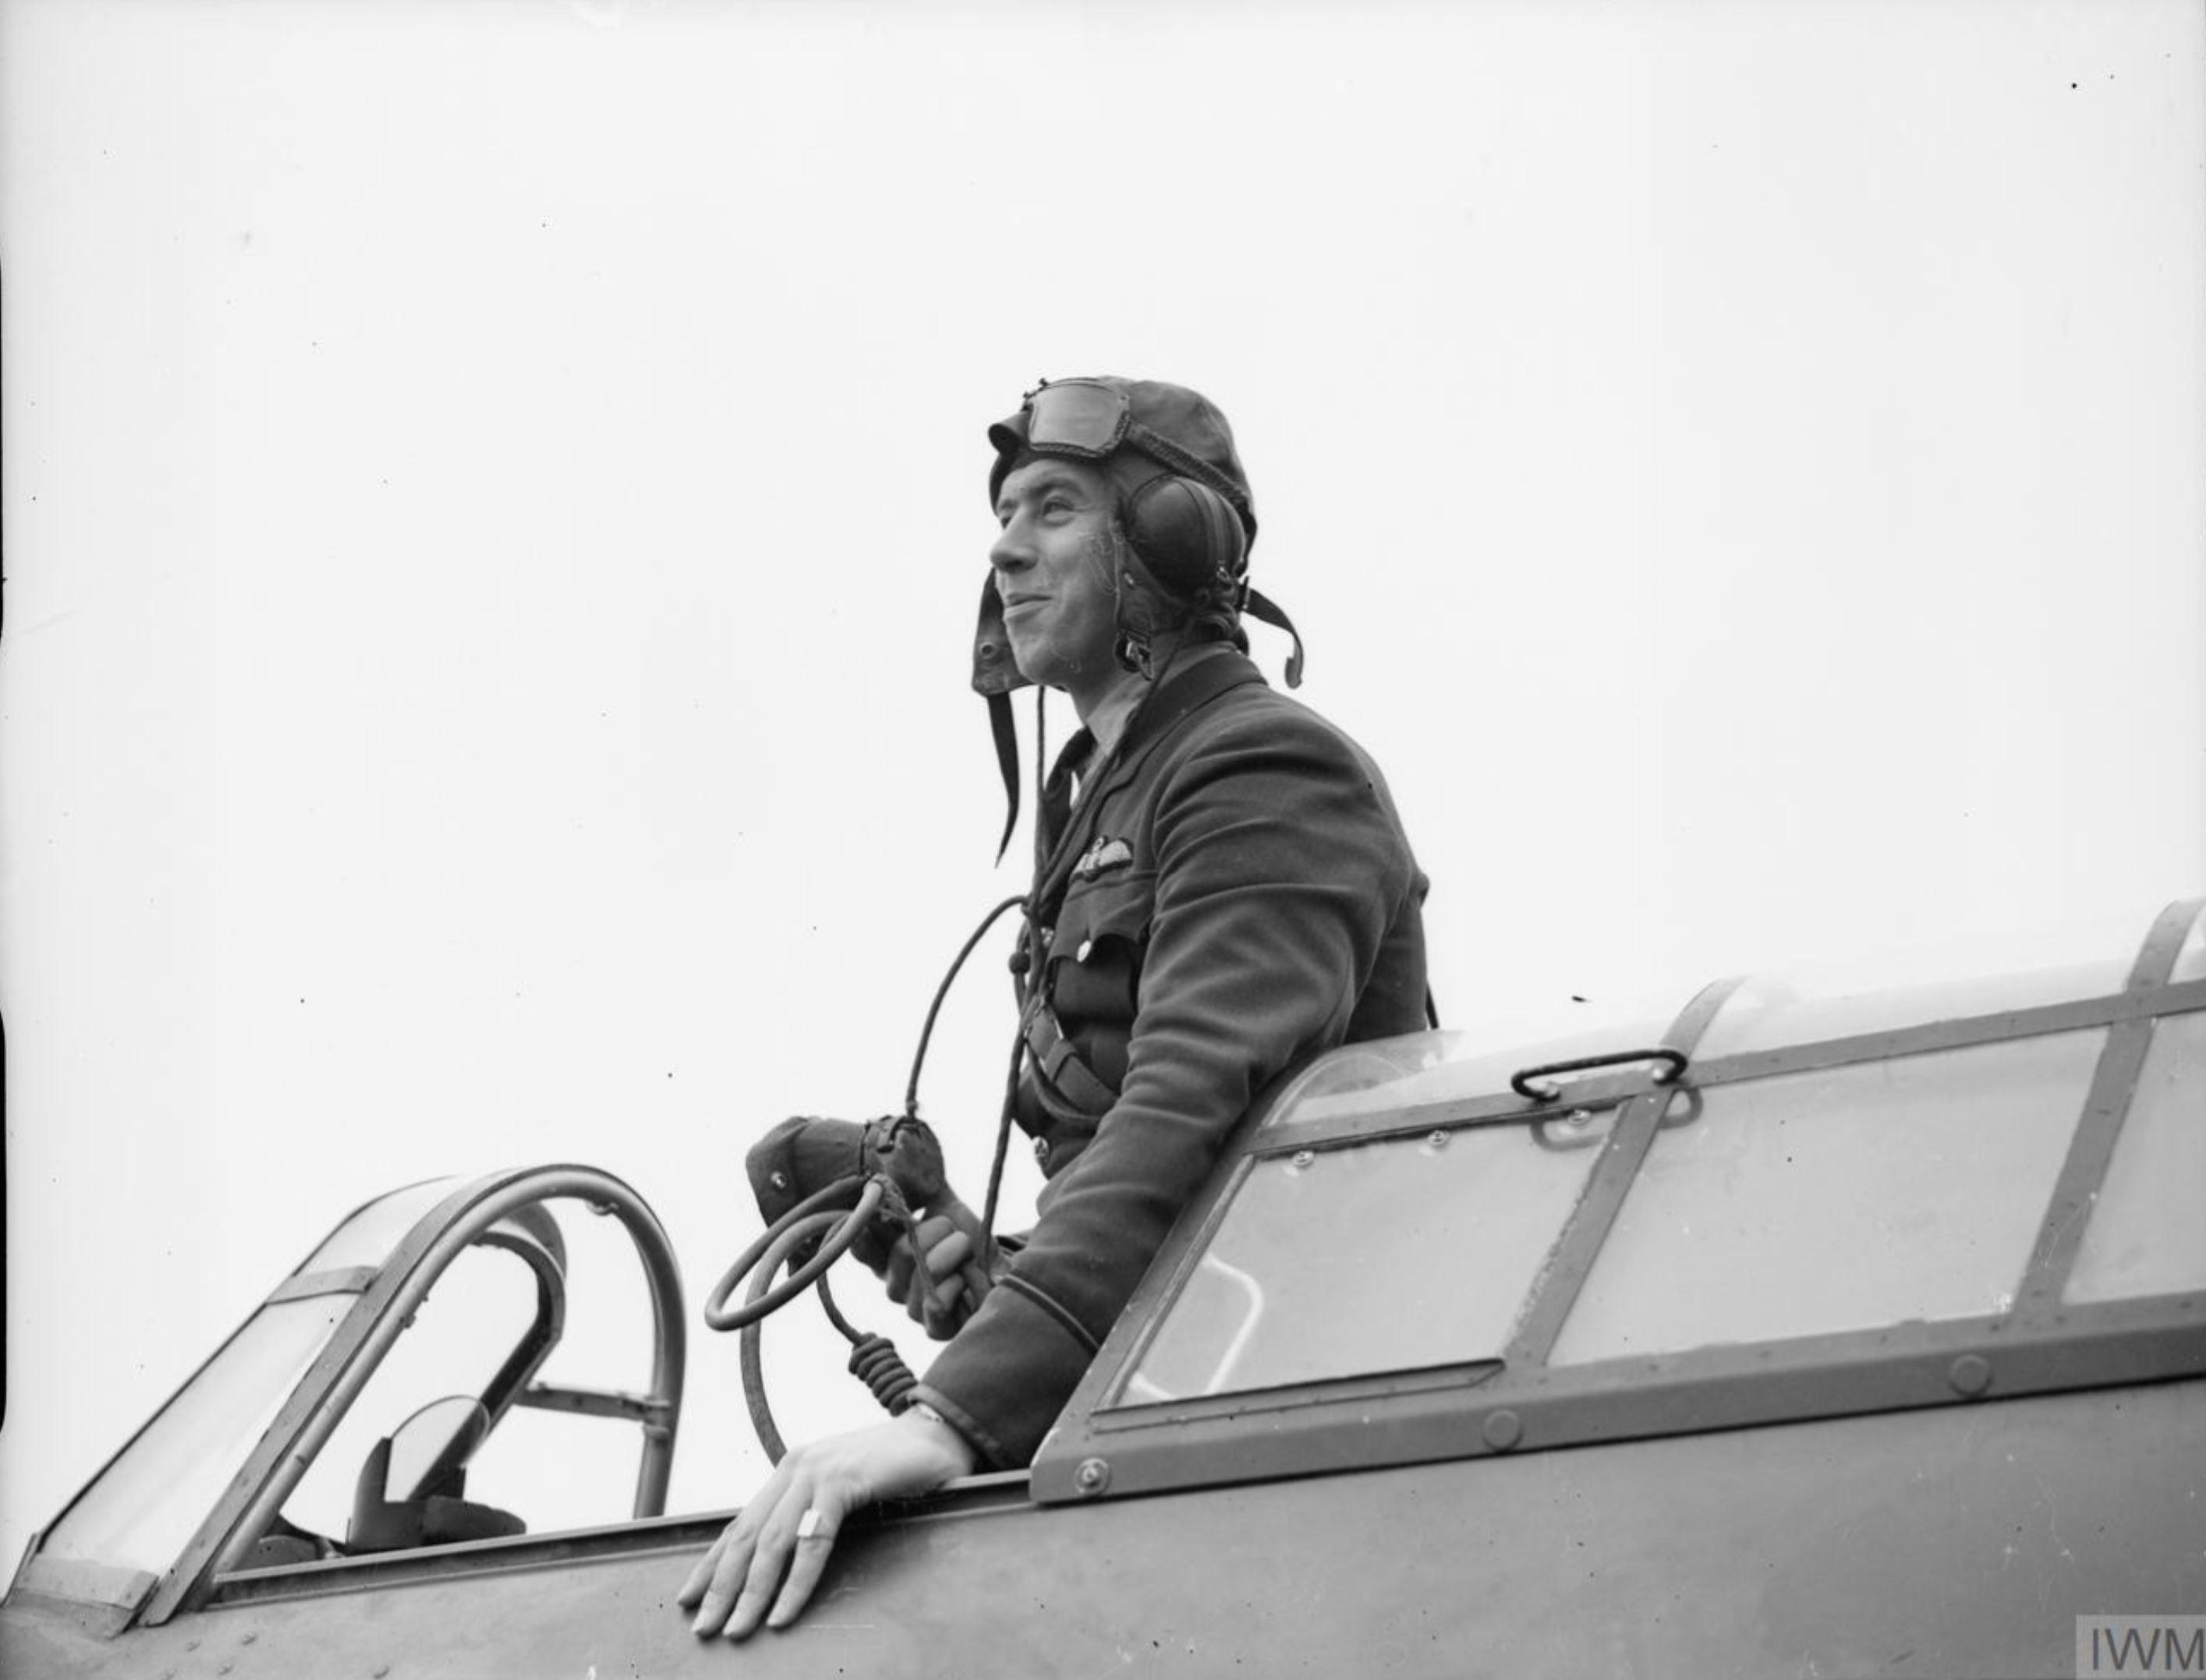 Aircrew RAF 73Sqn EJ Kain at Rouvres 1940 IWM C188